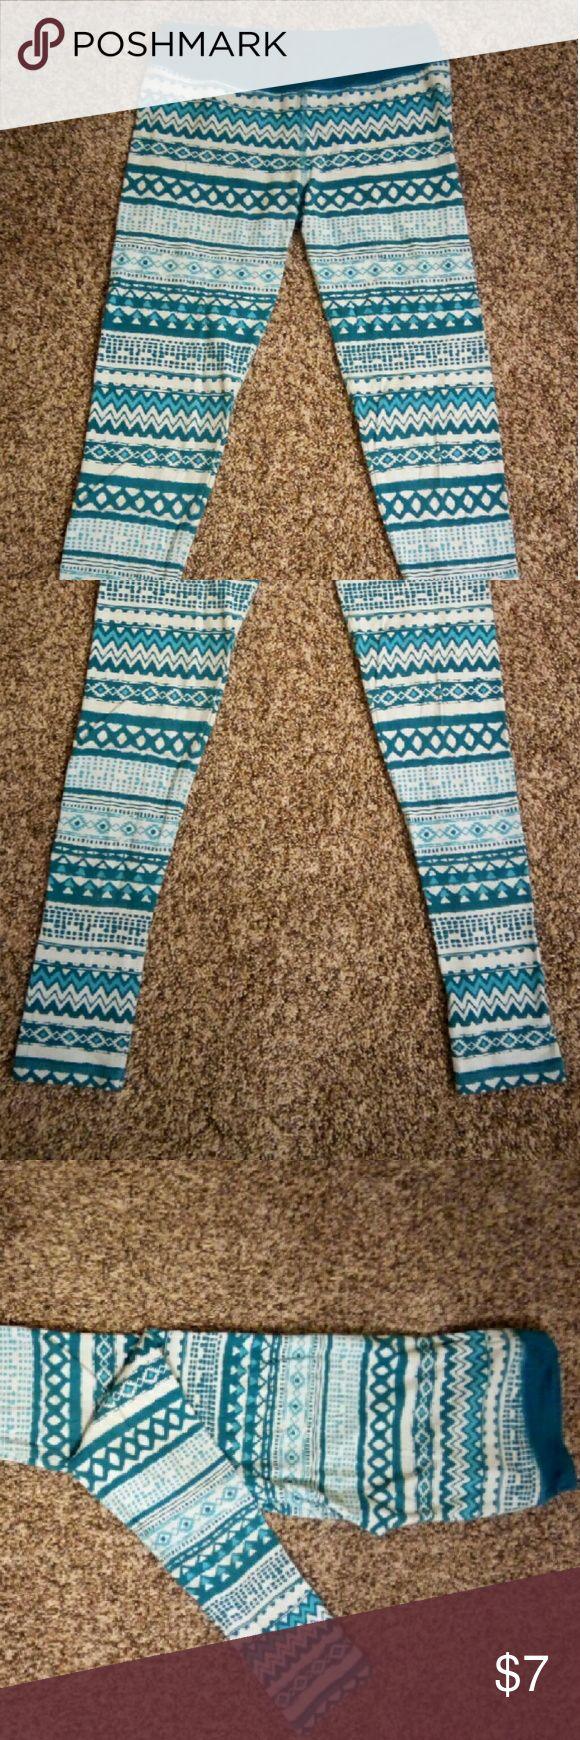 Aztec Pattern Leggings Blue Aztec Pattern Leggings, 95% cotton, 5% spandex Pants Leggings